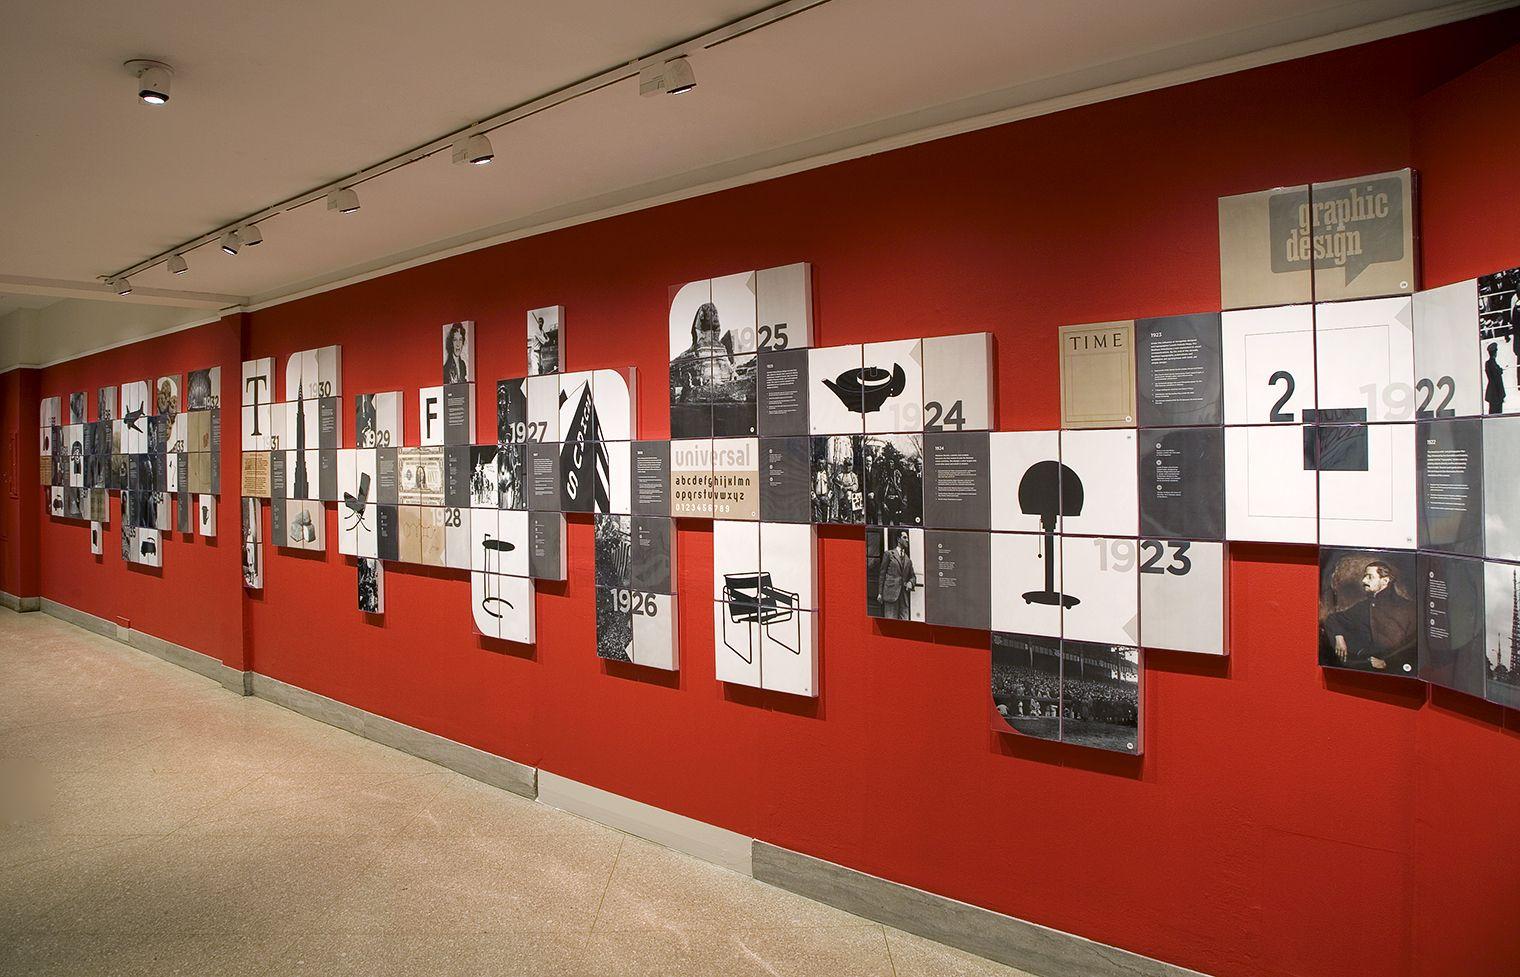 Design Developments Are Rendered In Black And White Silhouettes Other Events Are Represented W Exibition Design Office Interior Design Interior Design History